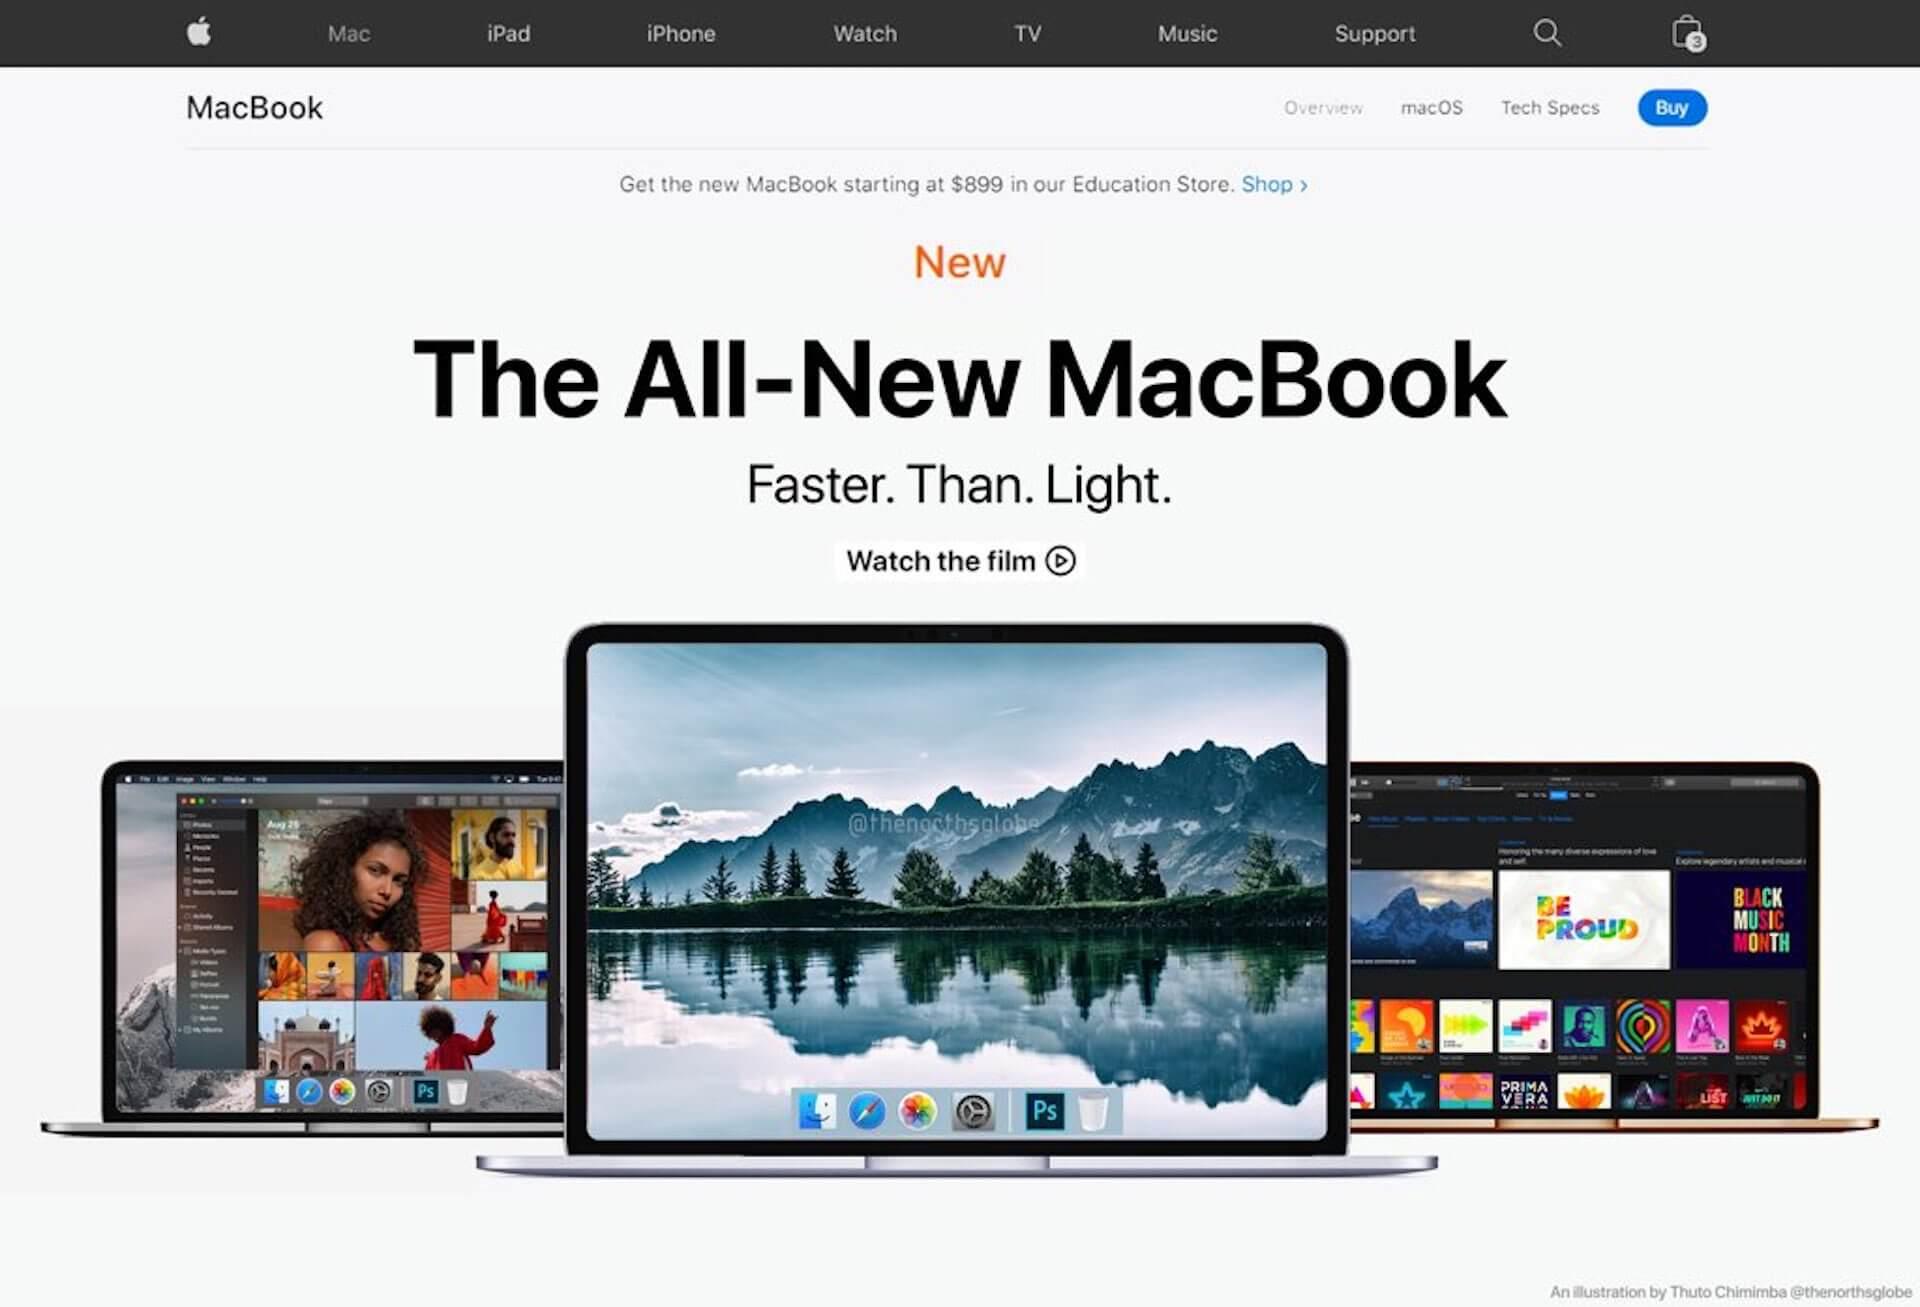 ARM搭載の新型MacBookがAppleサイトに登場!?発表済みと見間違えるほどのコンセプト画像が公開 tech200609_macbook_main